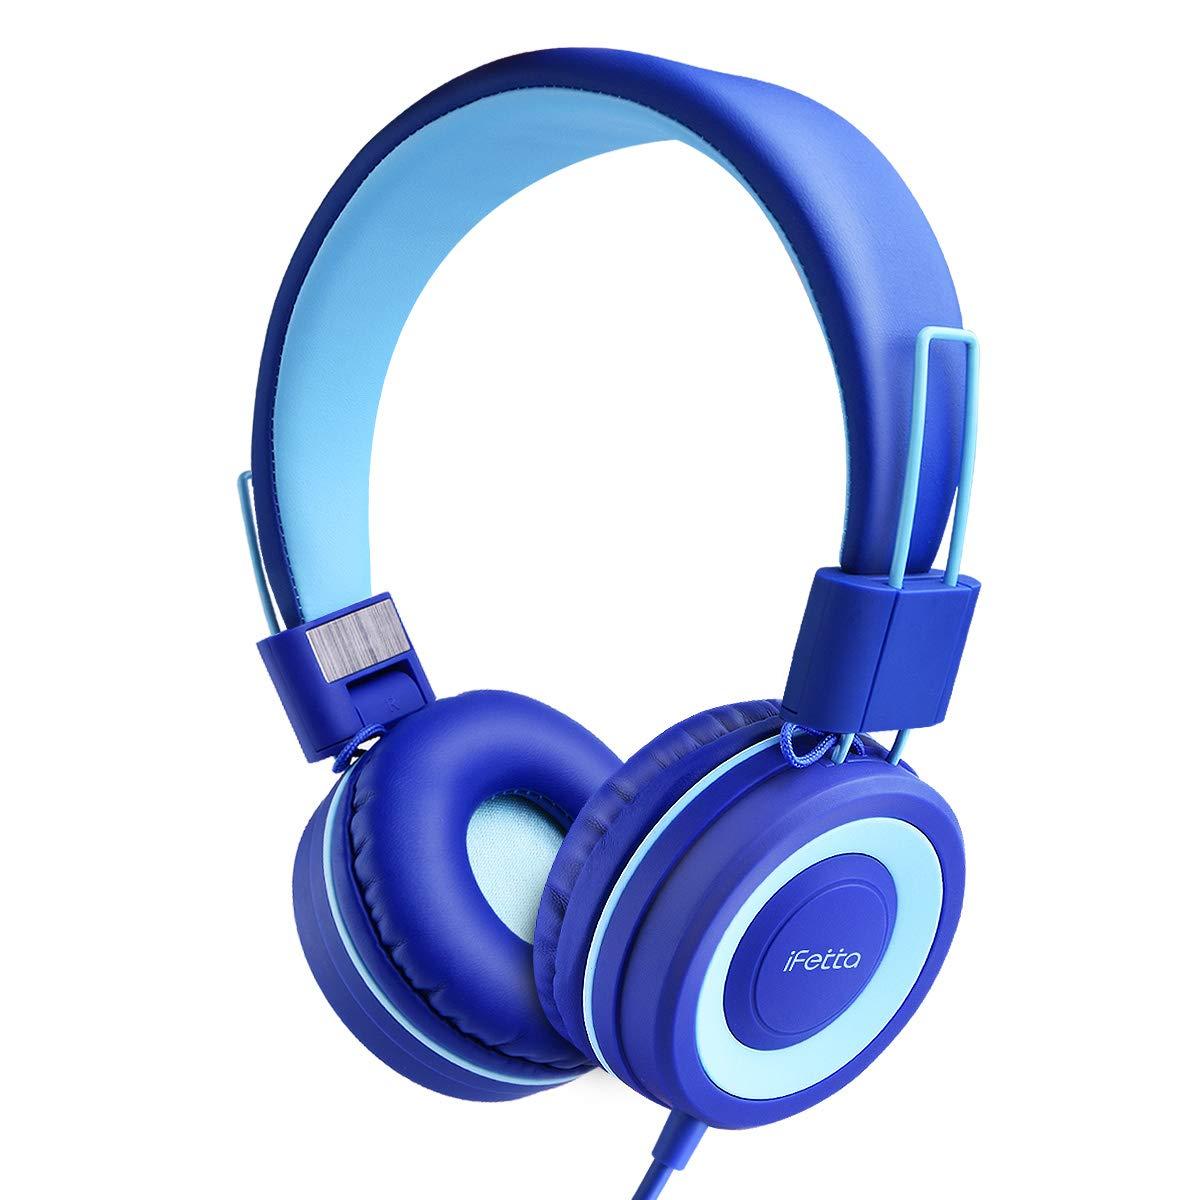 Auriculares para niños, ifecco auriculares